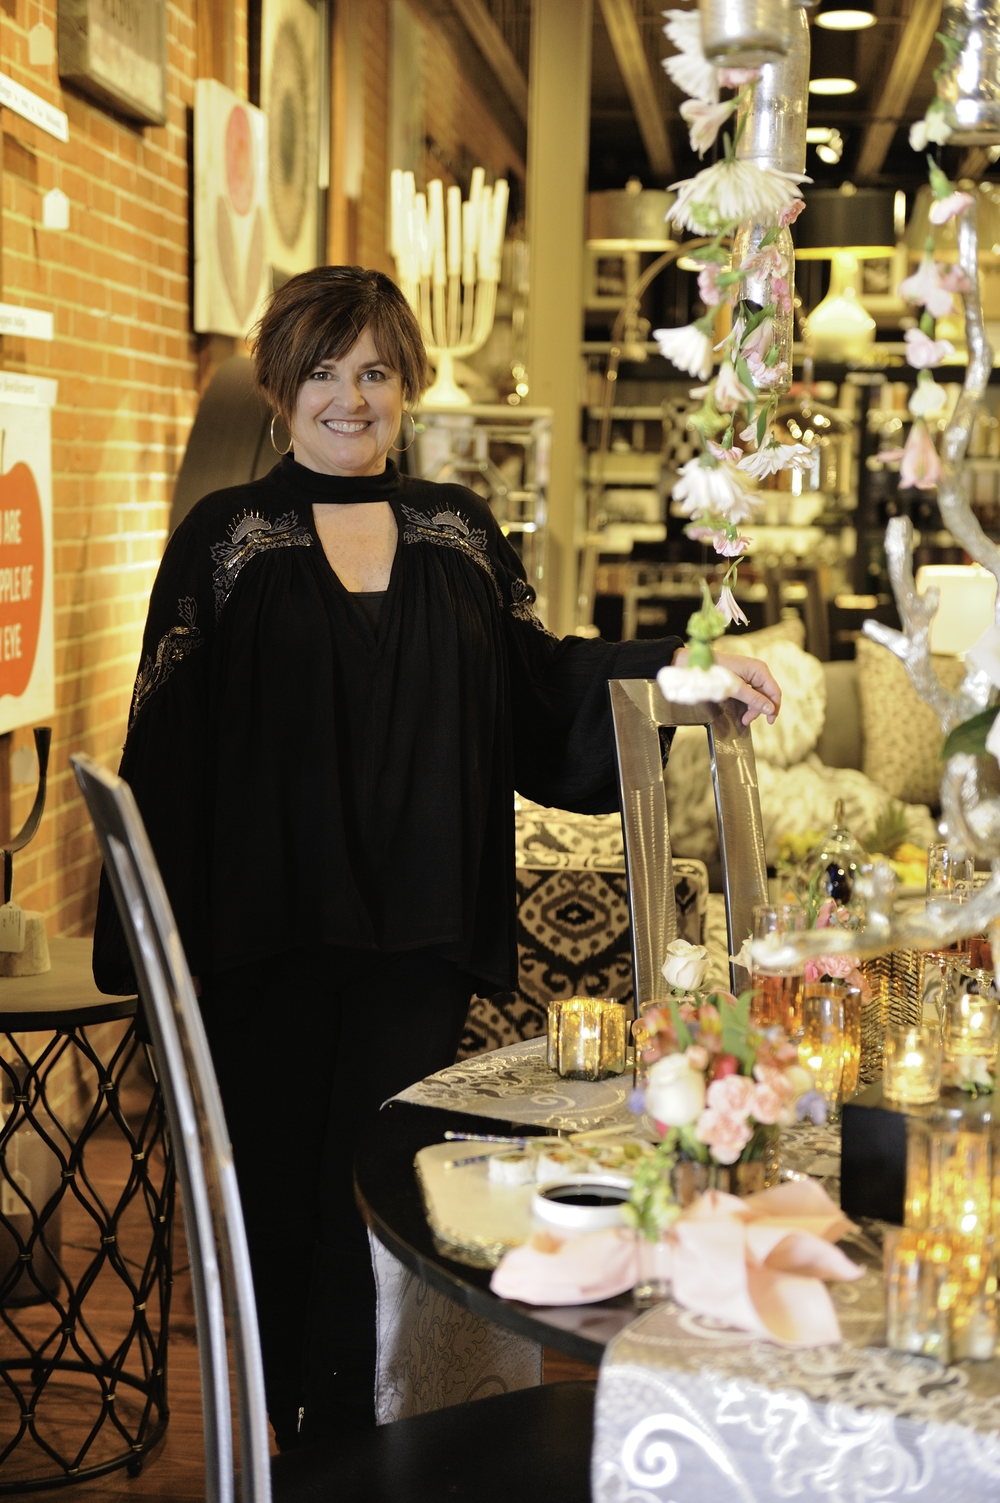 Designer Kathleen Matthews and her magical tabletop creation.